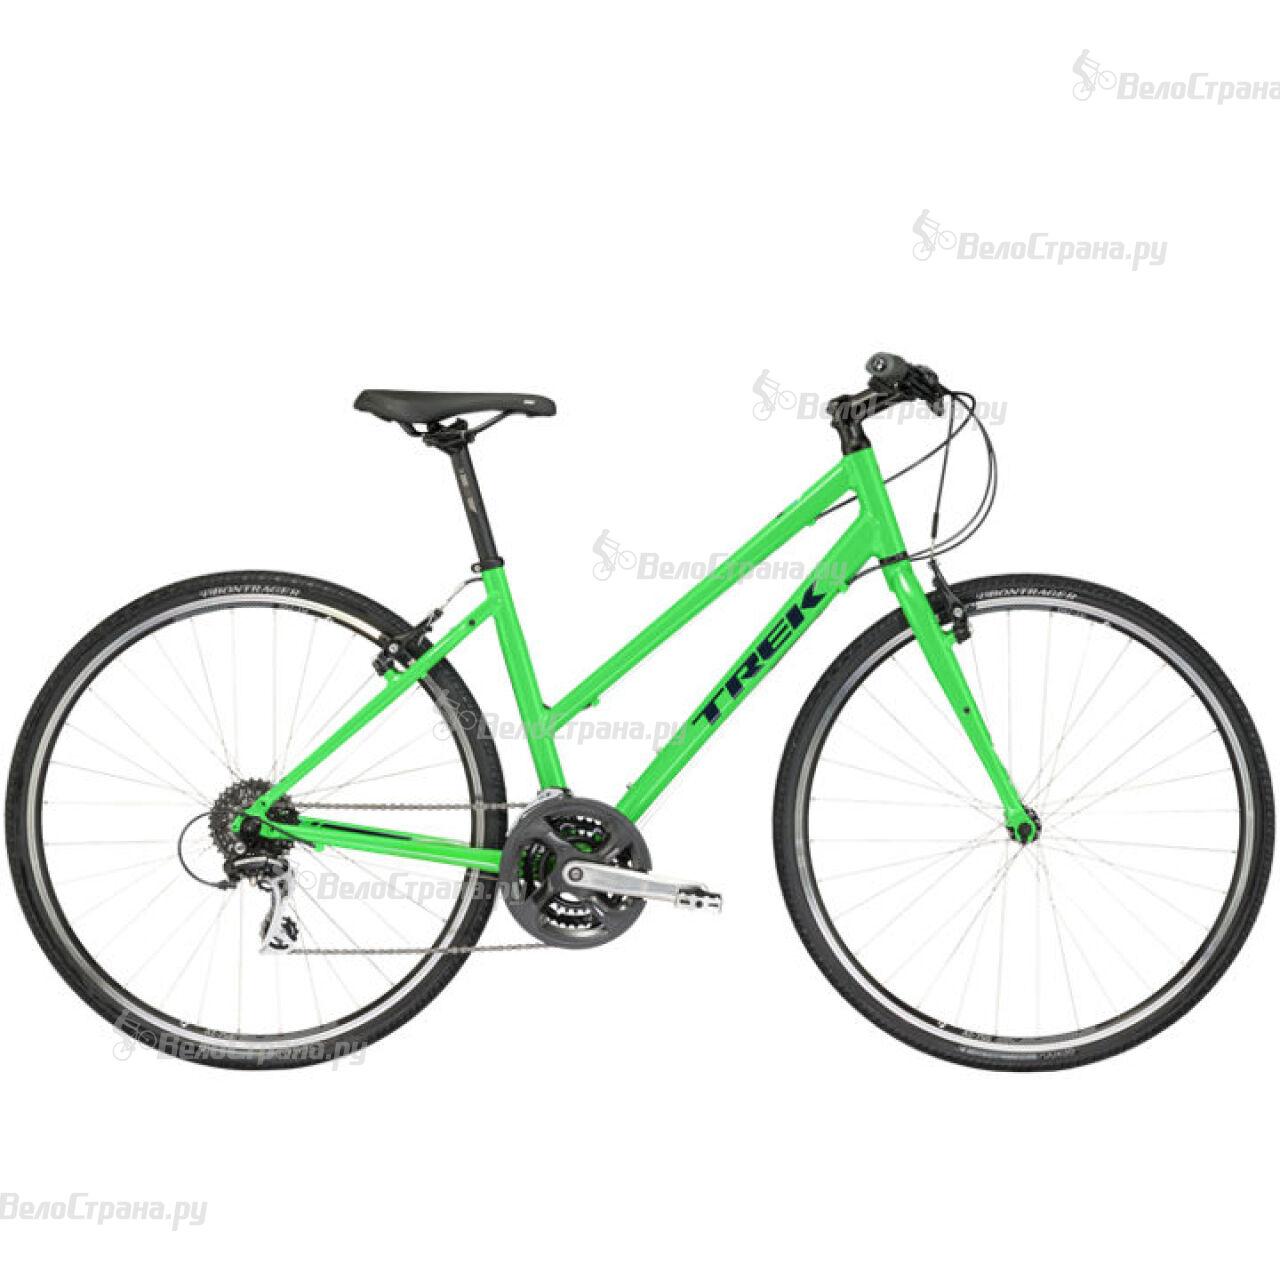 Велосипед Trek FX 2 WSD (2017) trek 7 2 fx wsd 2015